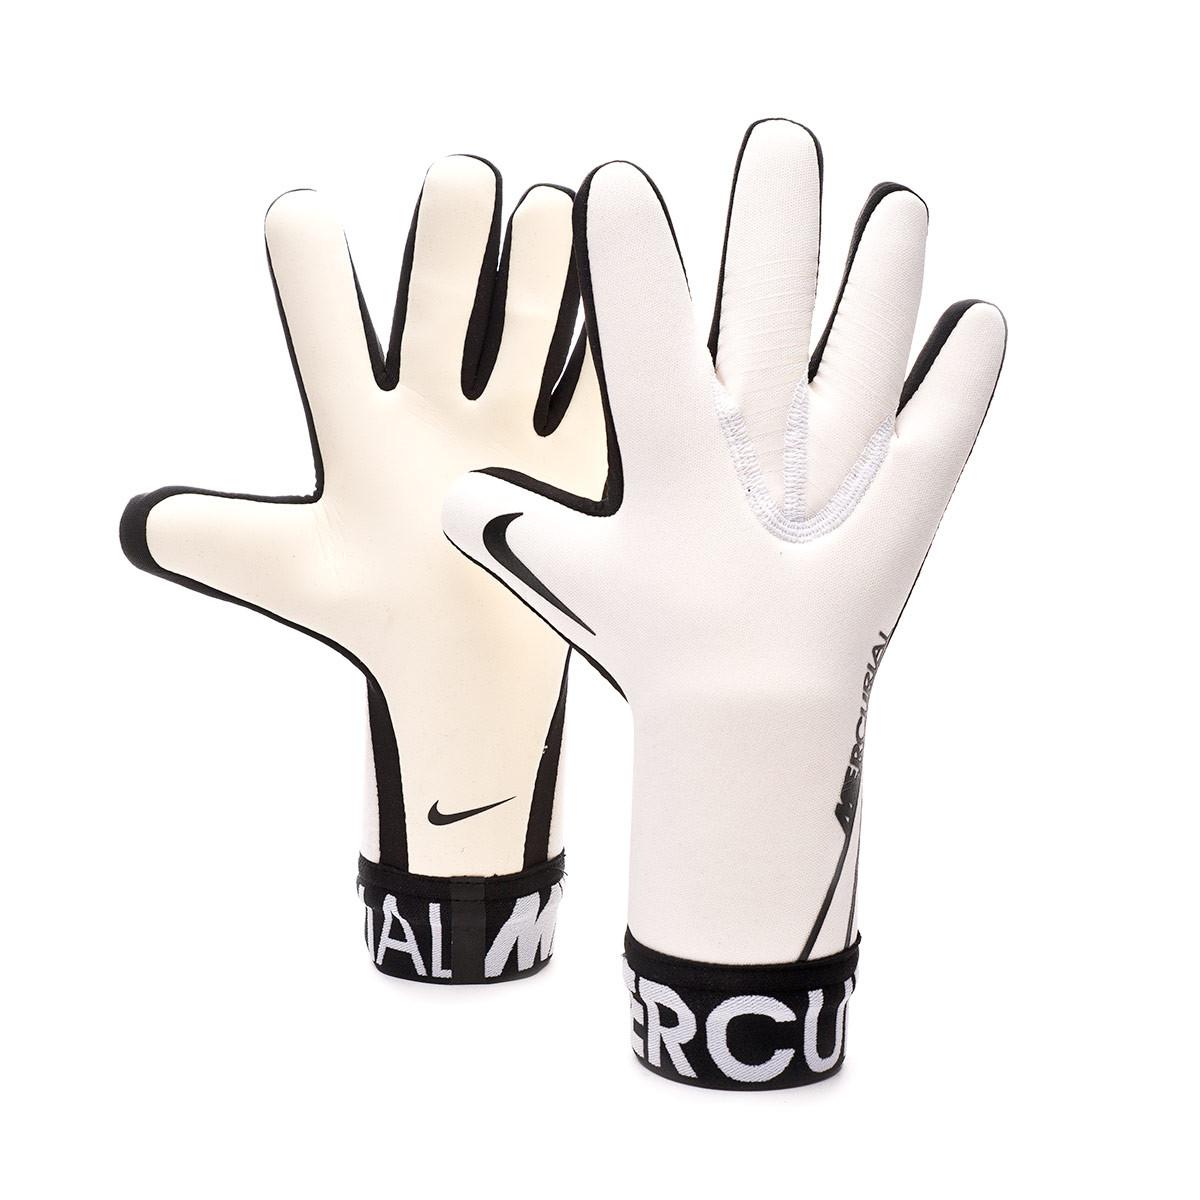 meteorito Representar Europa  Glove Nike Mercurial Touch Victory White-Black - Football store Fútbol  Emotion